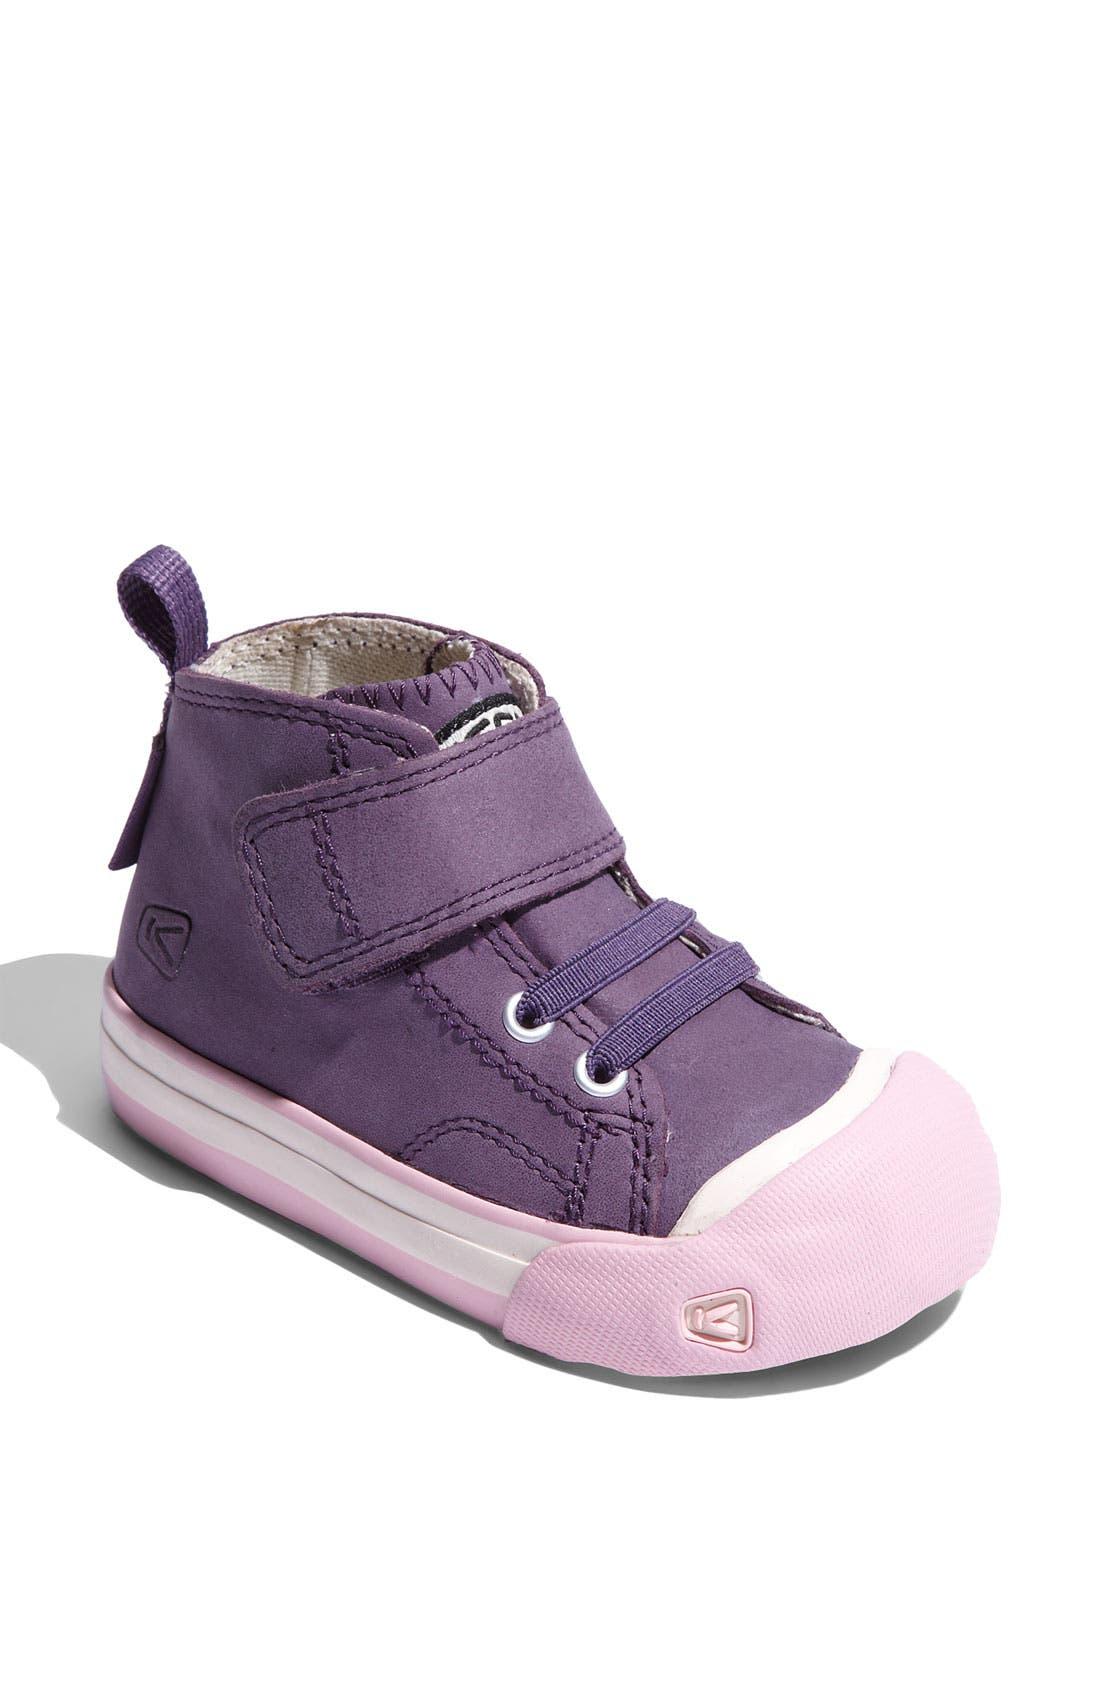 Alternate Image 1 Selected - Keen 'Coronado' High Top (Baby, Walker & Toddler)